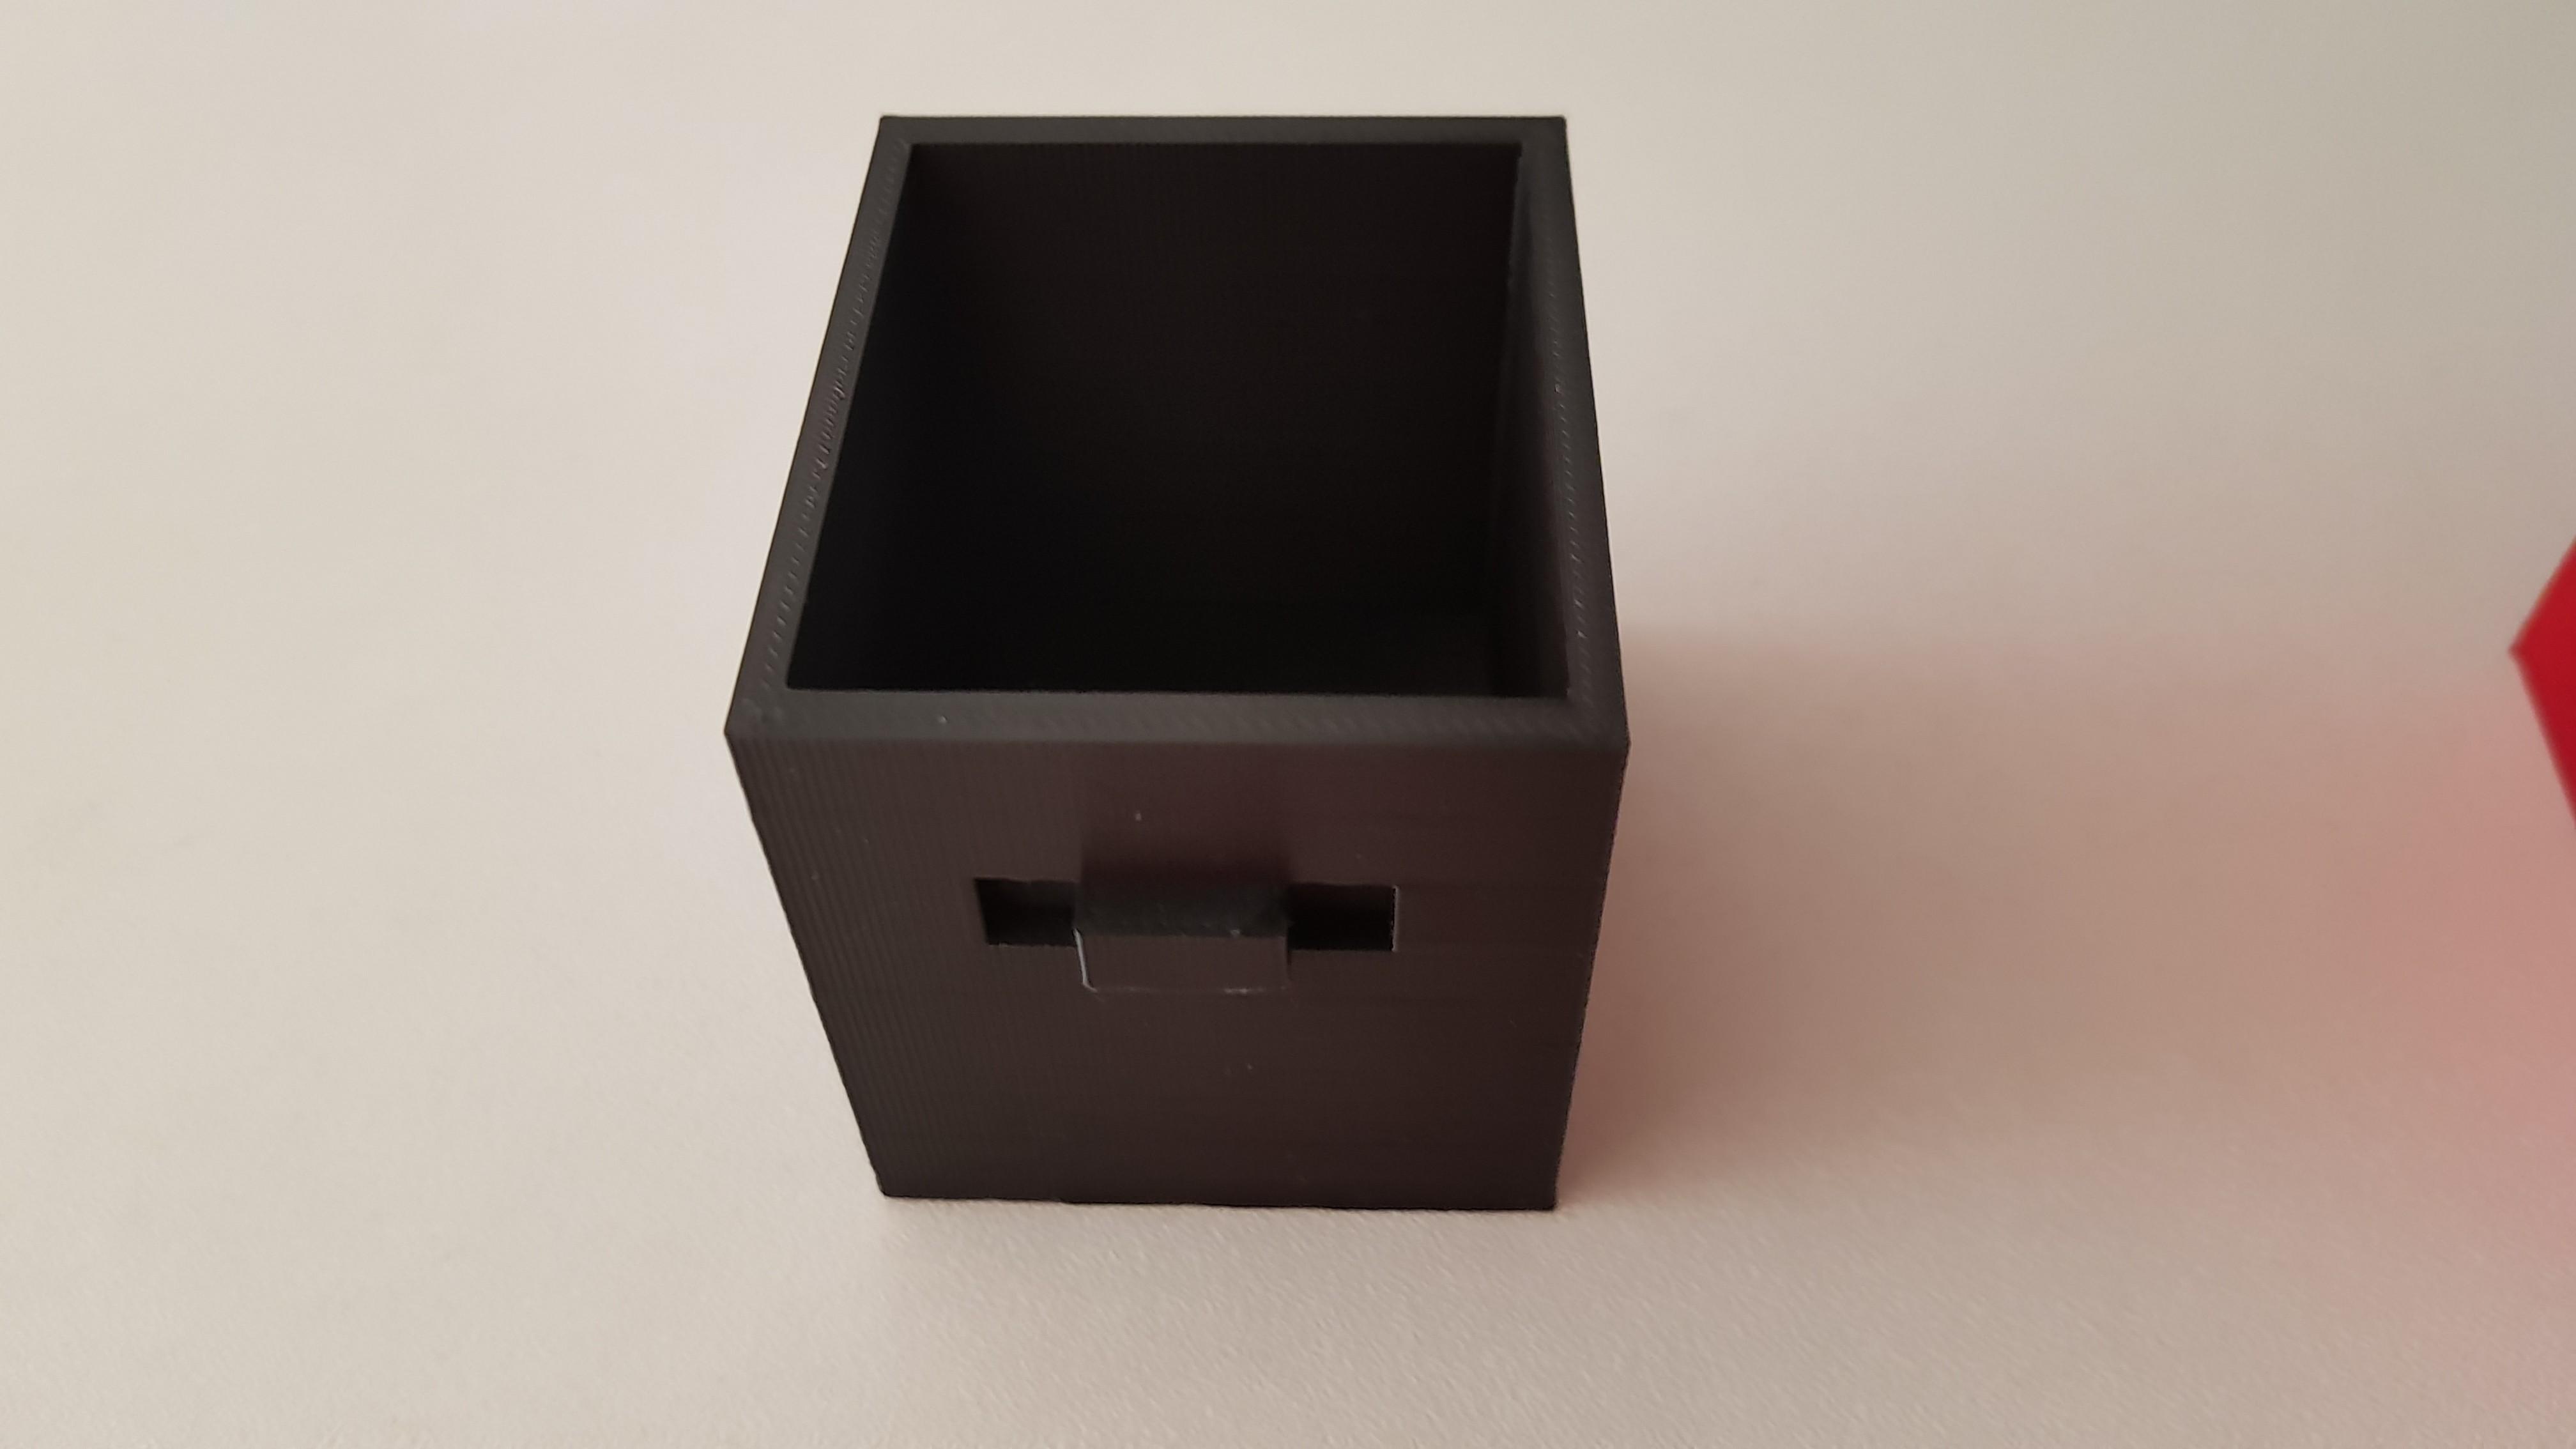 20180218_170224.jpg Download free STL file small box • 3D printable object, solunkejagruti